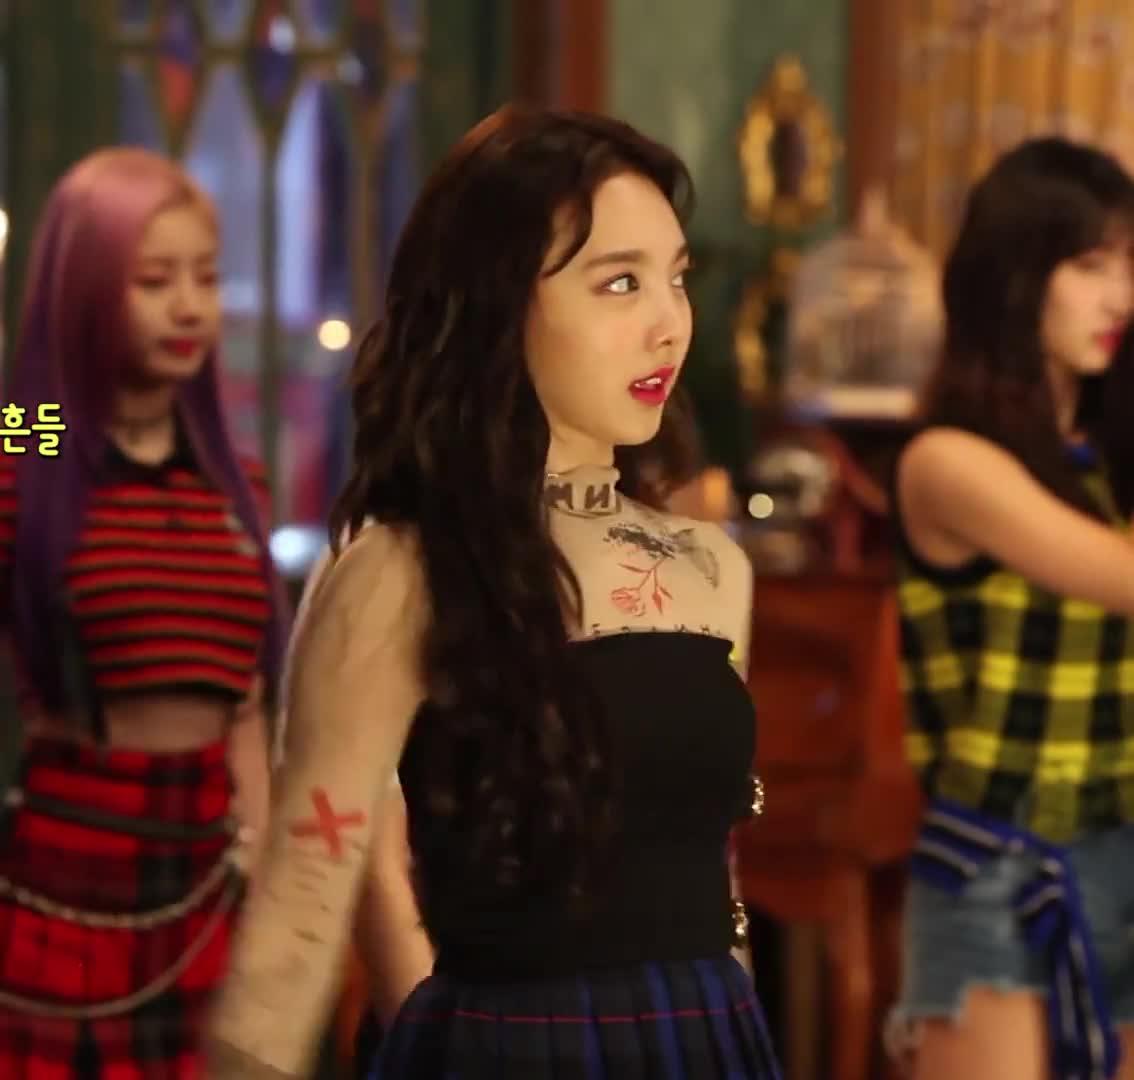 celebs, kpop, nayeon, twice, PlumpDecisiveDegu GIFs